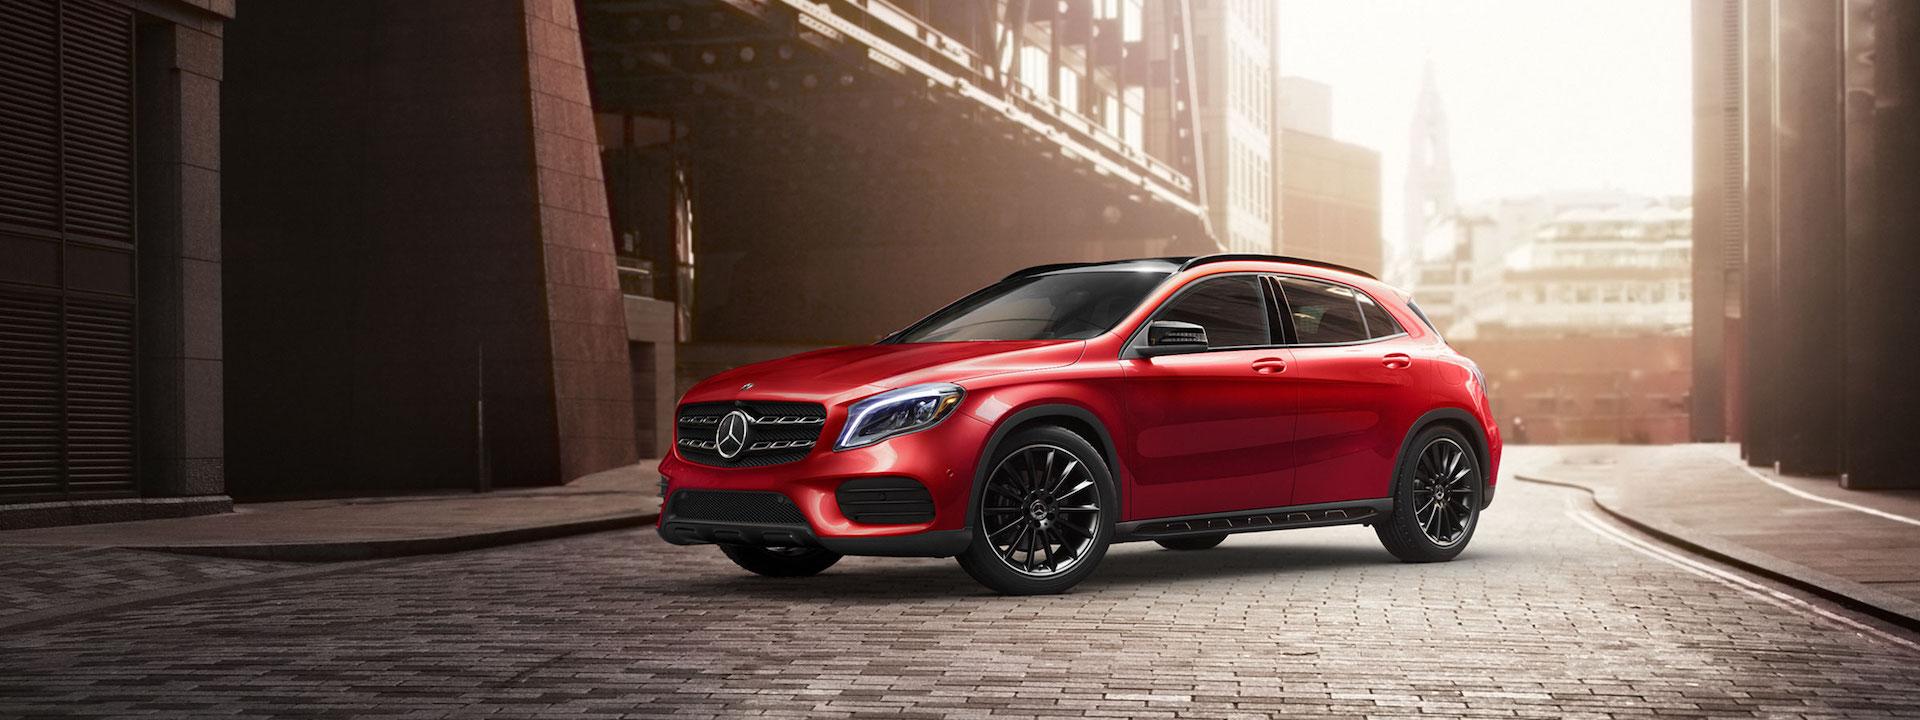 2020 Mercedes-Benz GLA SUV | Mercedes-Benz of Fort Walton Beach